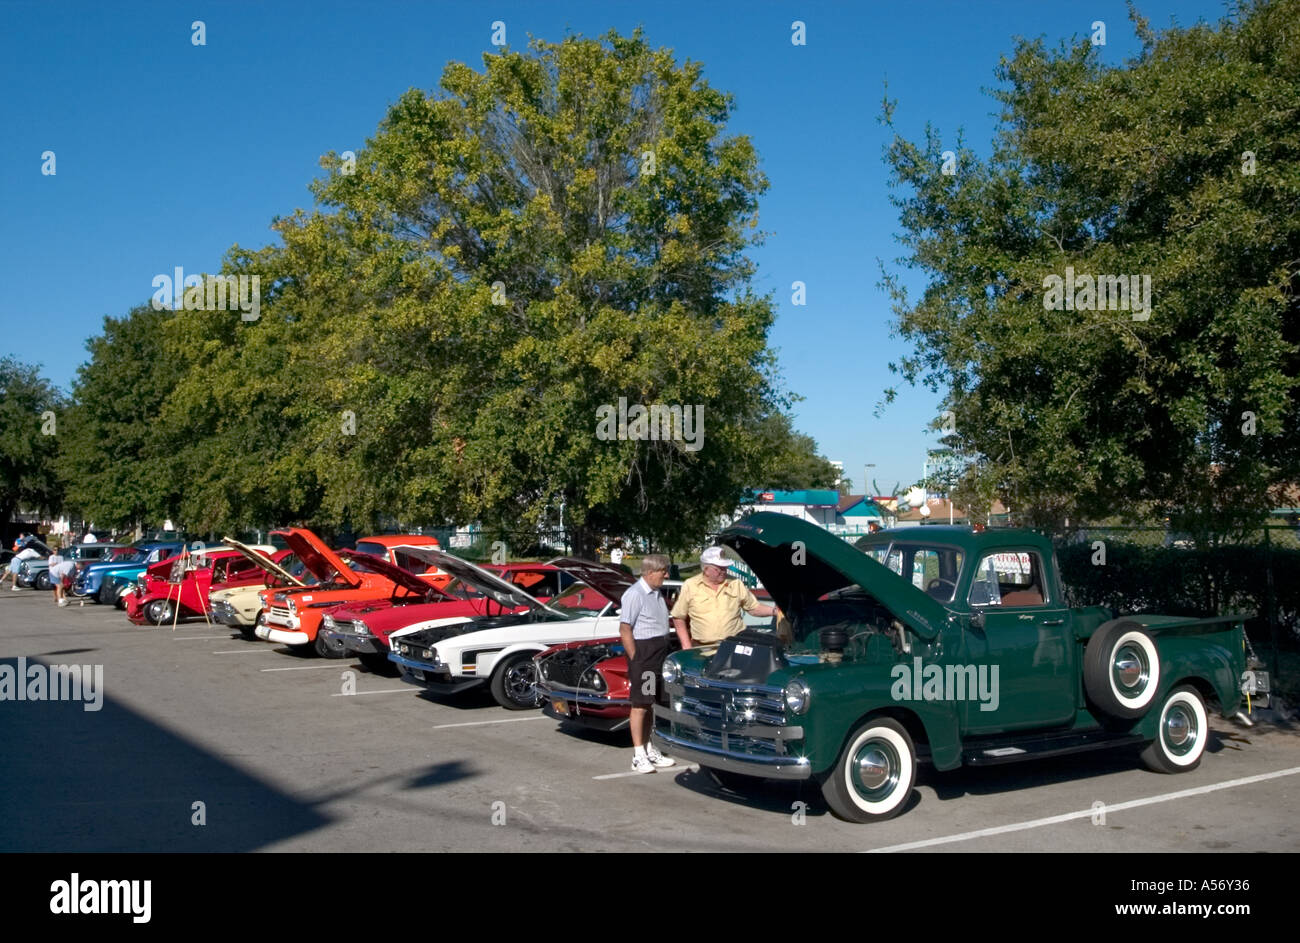 Vintage Cars Kissimmee Old Town Kissimmee Orlando Florida Usa